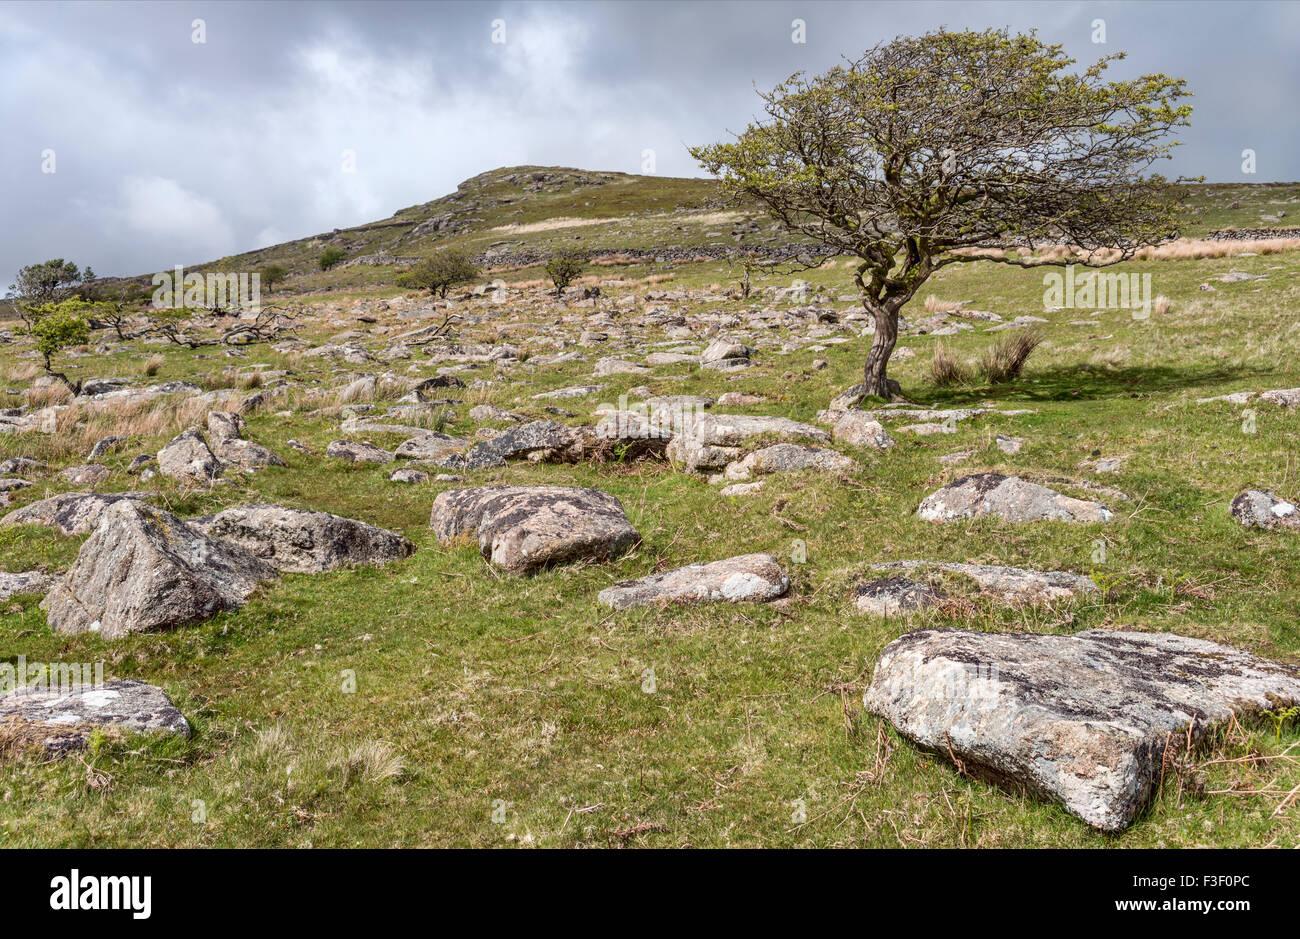 Landscape at the Dartmoor National Park, Devon, England, UK | Landschaft im Dartmoor National Park, Devon, England, - Stock Image